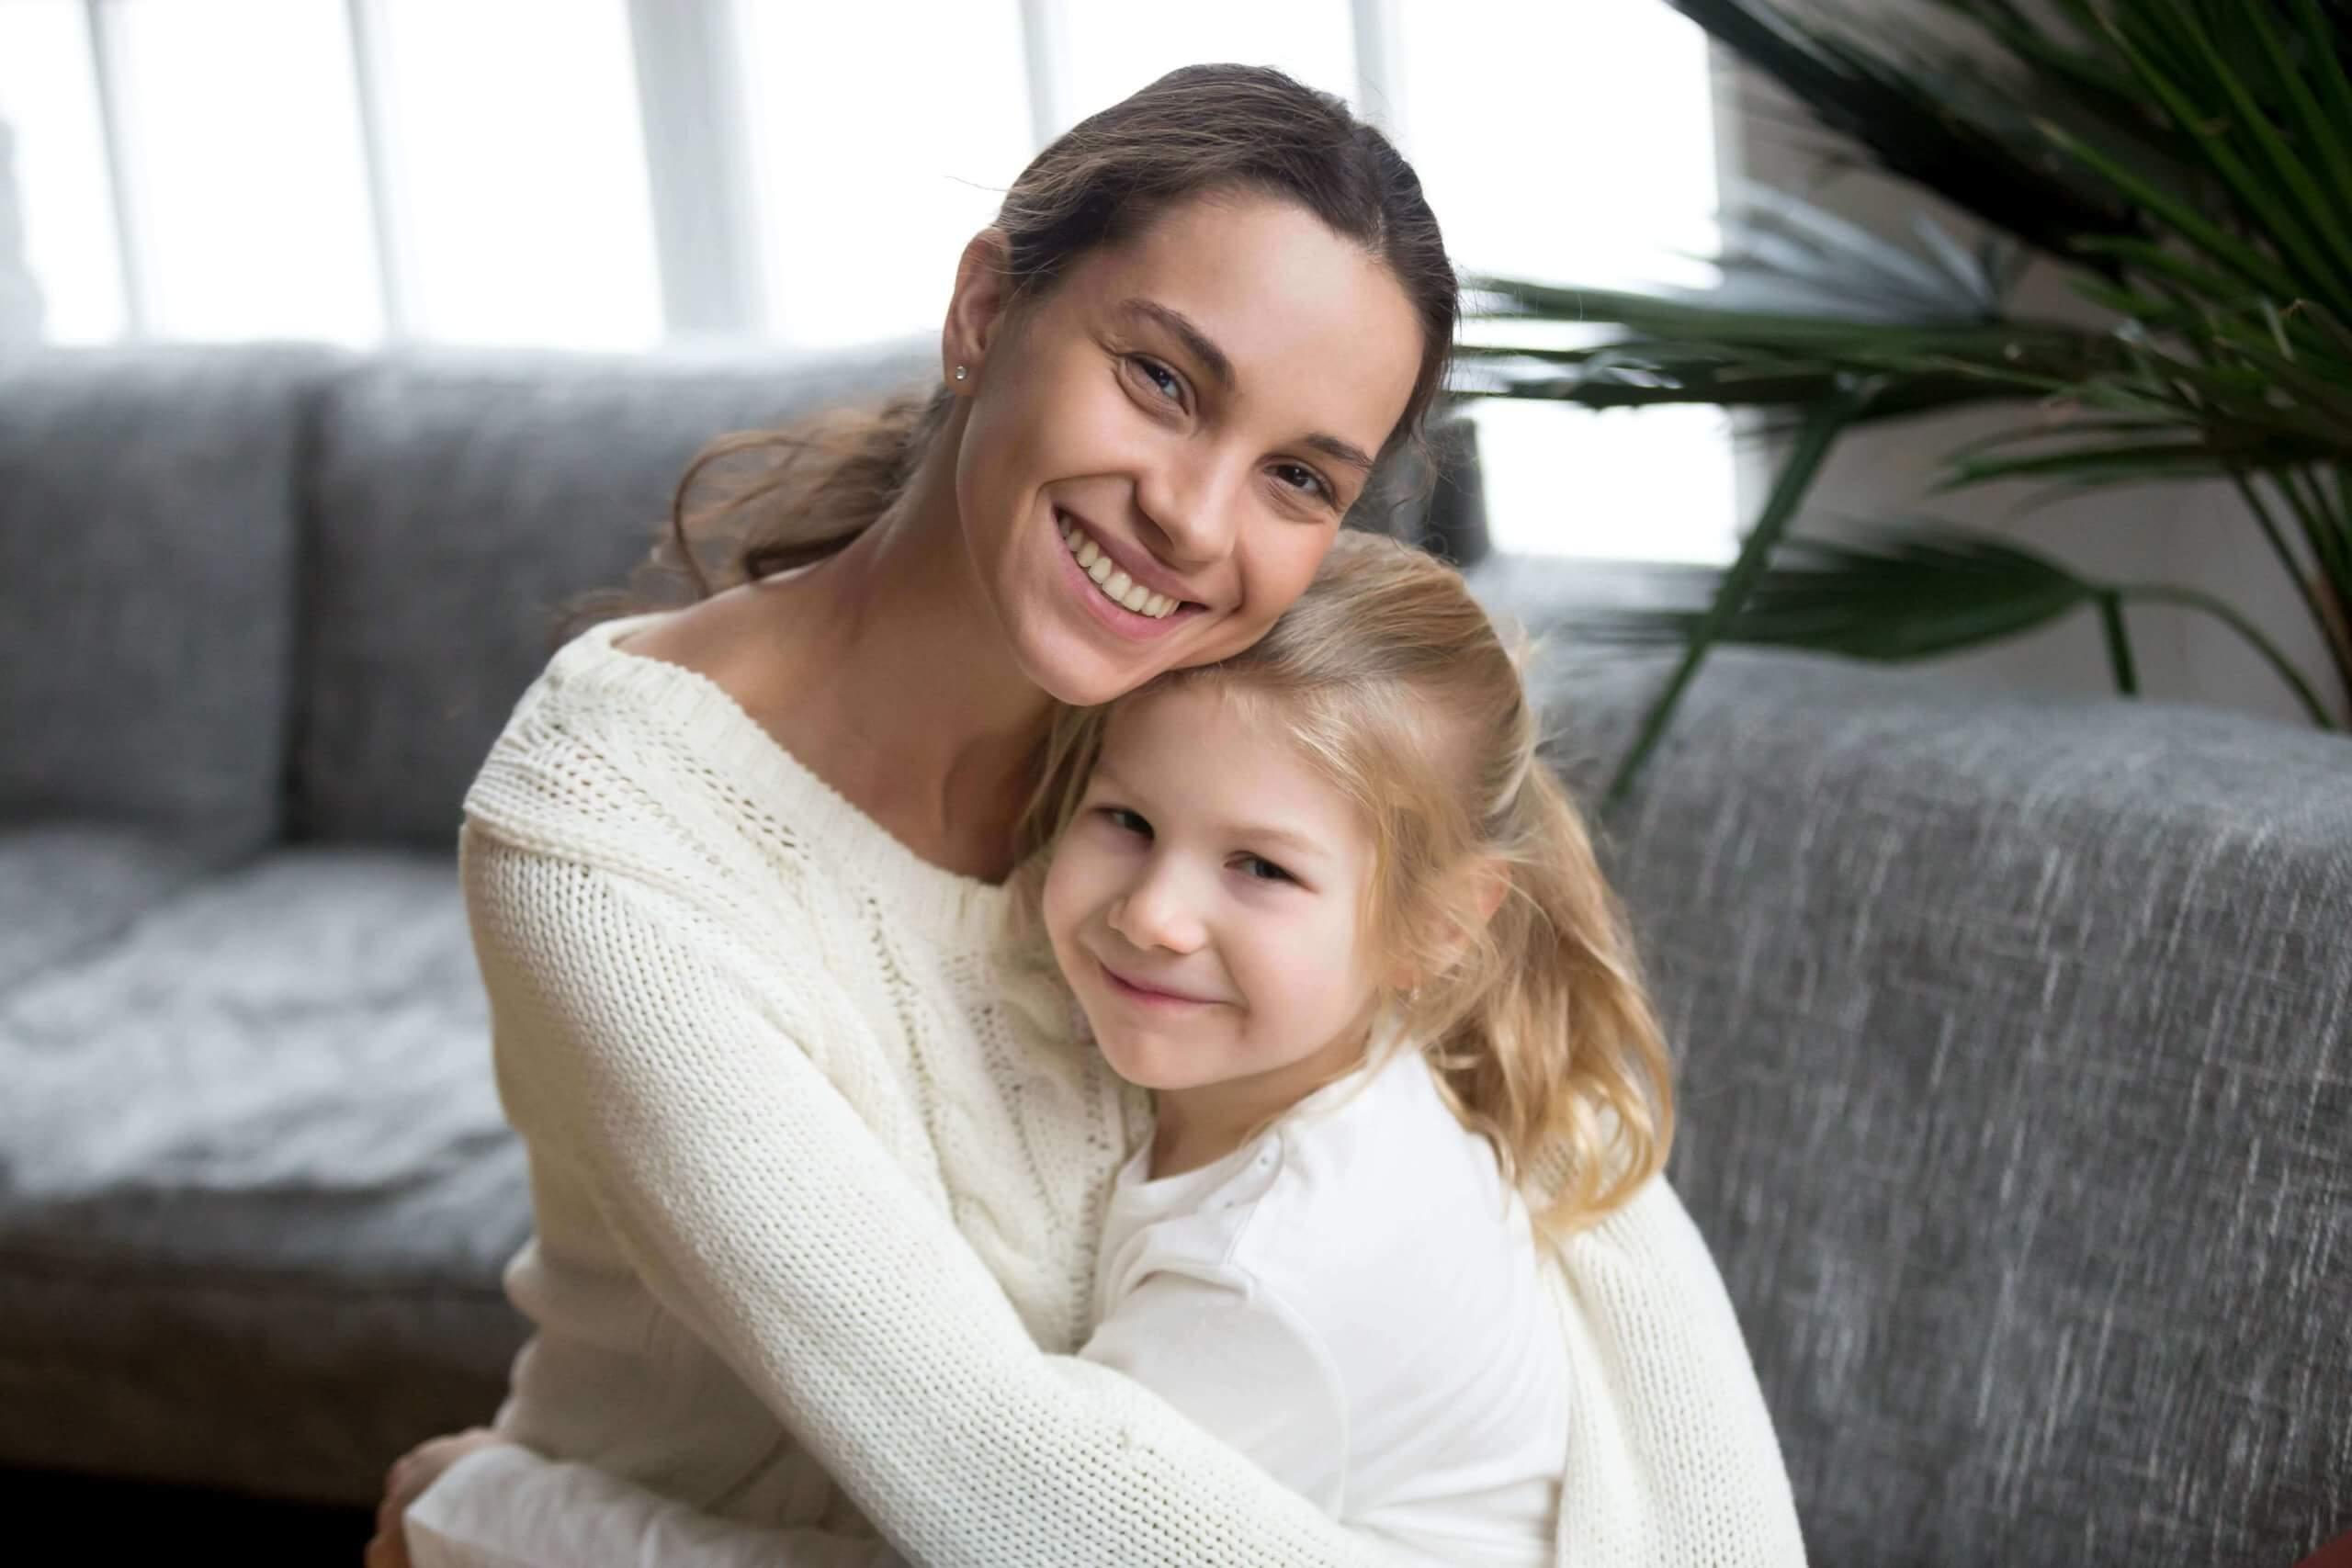 portrait-happy-loving-single-mother-hugging-cute-little-daughter-min (1) (1)